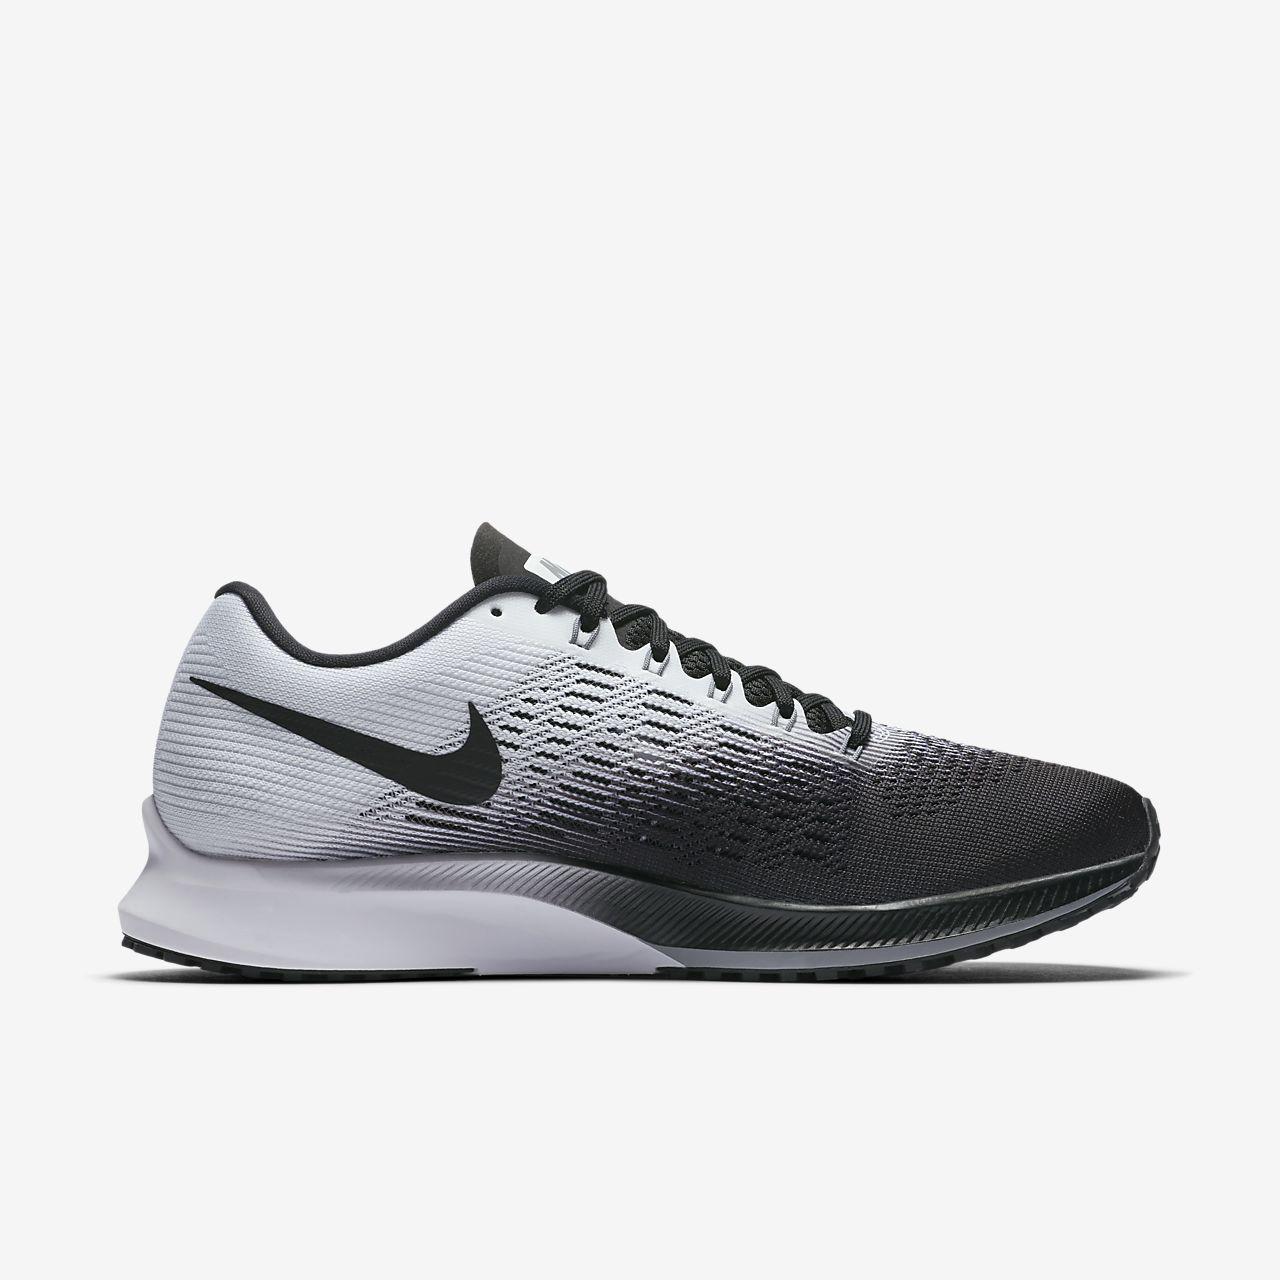 Air Hommes Zoom Élite 9 Chaussures De Course Nike 4Fx9NvaEO